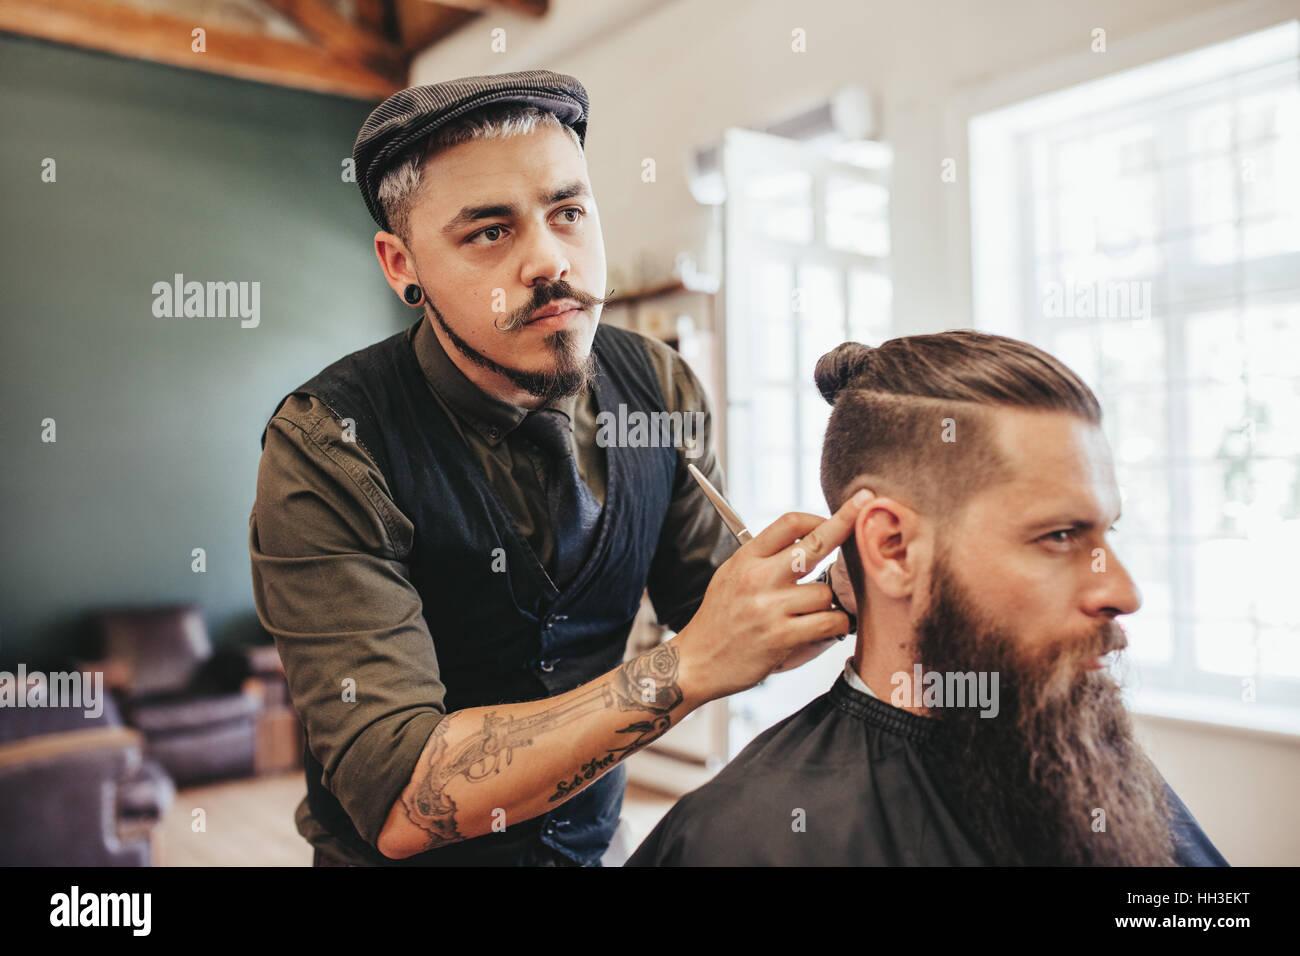 Friseur, Überprüfung der Symmetrie der Haarschnitt seines Mandanten im Barbershop. Bärtiger Mann Stockbild